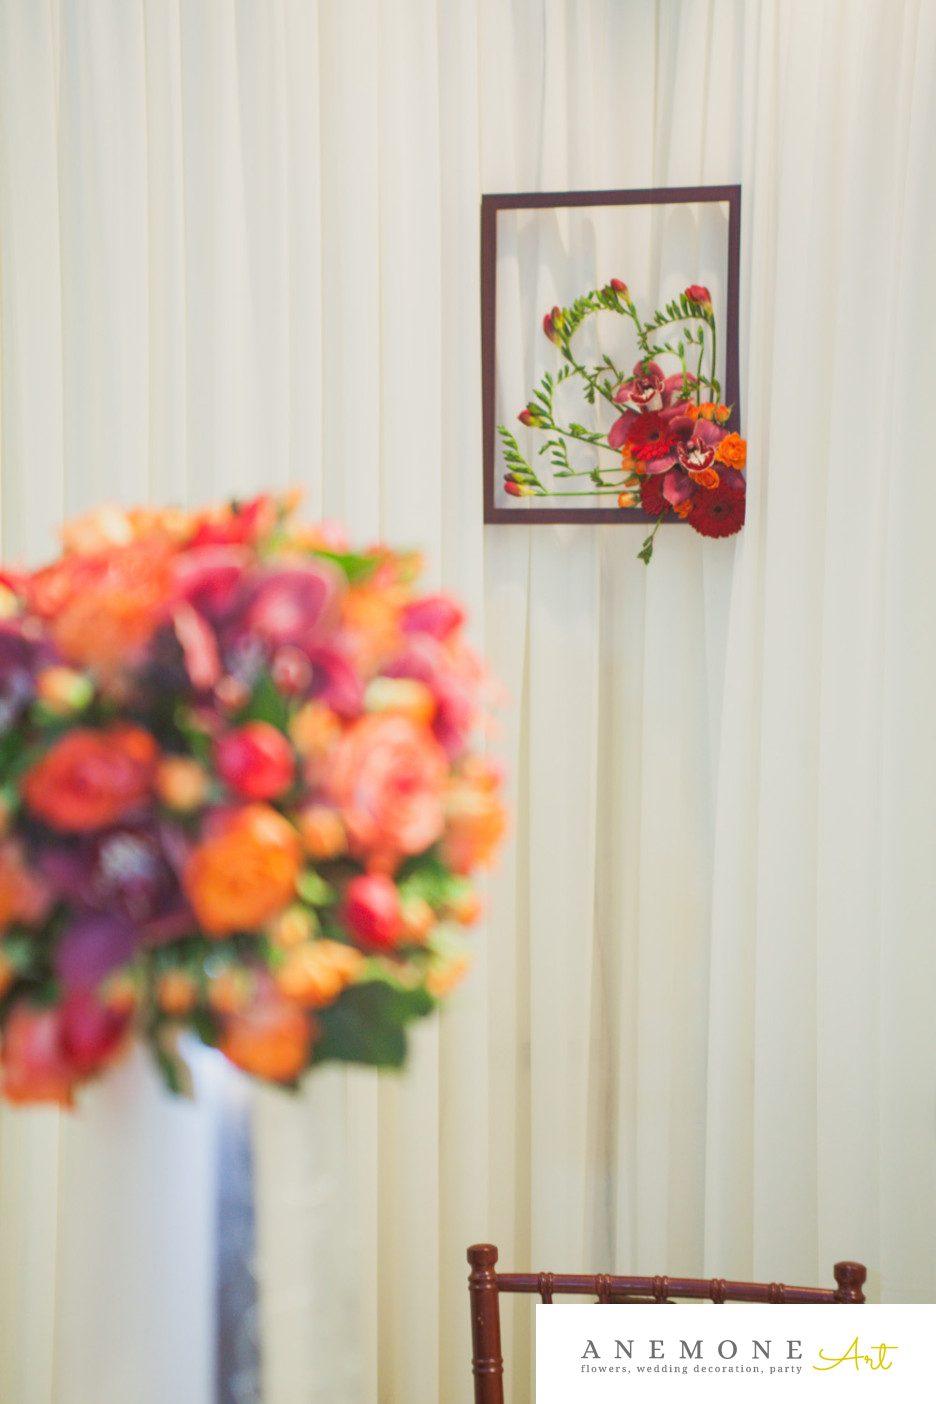 Poza, foto cu Flori de nunta cymbidium, frezii, mini-gerbera, mini-rosa, orhidee, portocaliu, rosu, tablou in Arad, Timisoara, Oradea (wedding flowers, bouquets) nunta Arad, Timisoara, Oradea